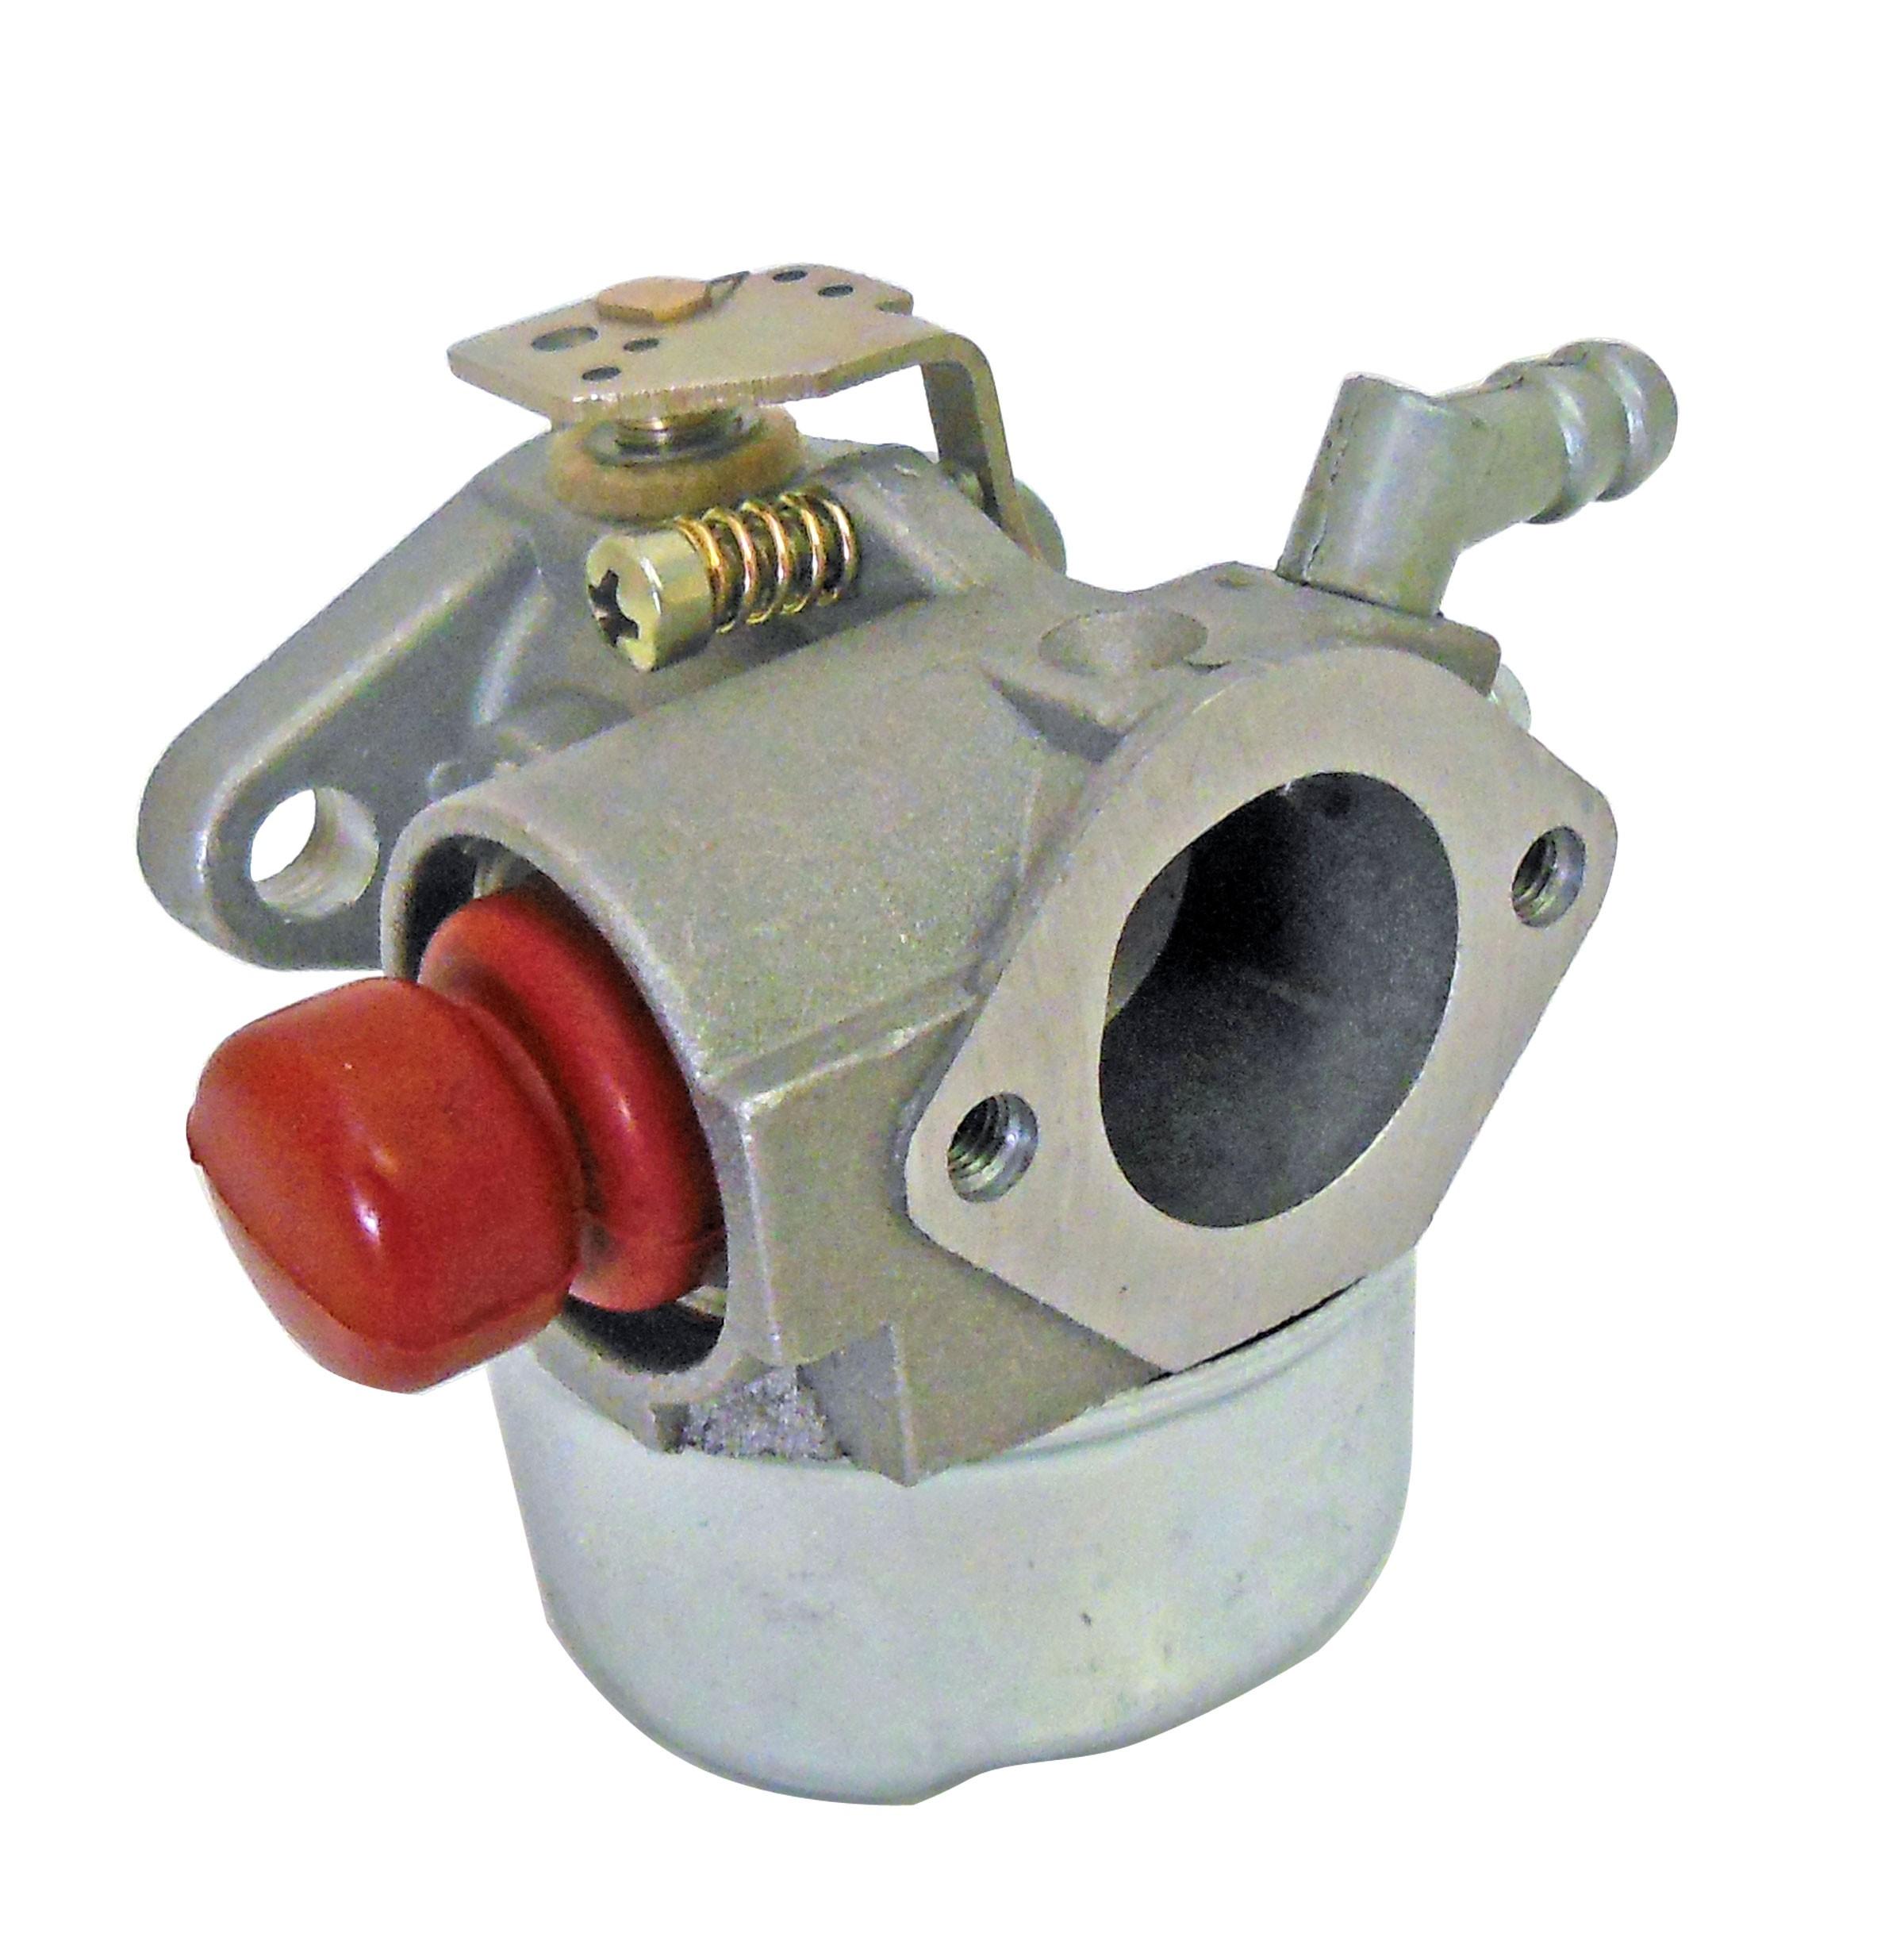 Tecumseh 6 5 Hp Engine Diagram 2 Replacement Carburetor for Tecumseh Ohh Engine Of Tecumseh 6 5 Hp Engine Diagram 2